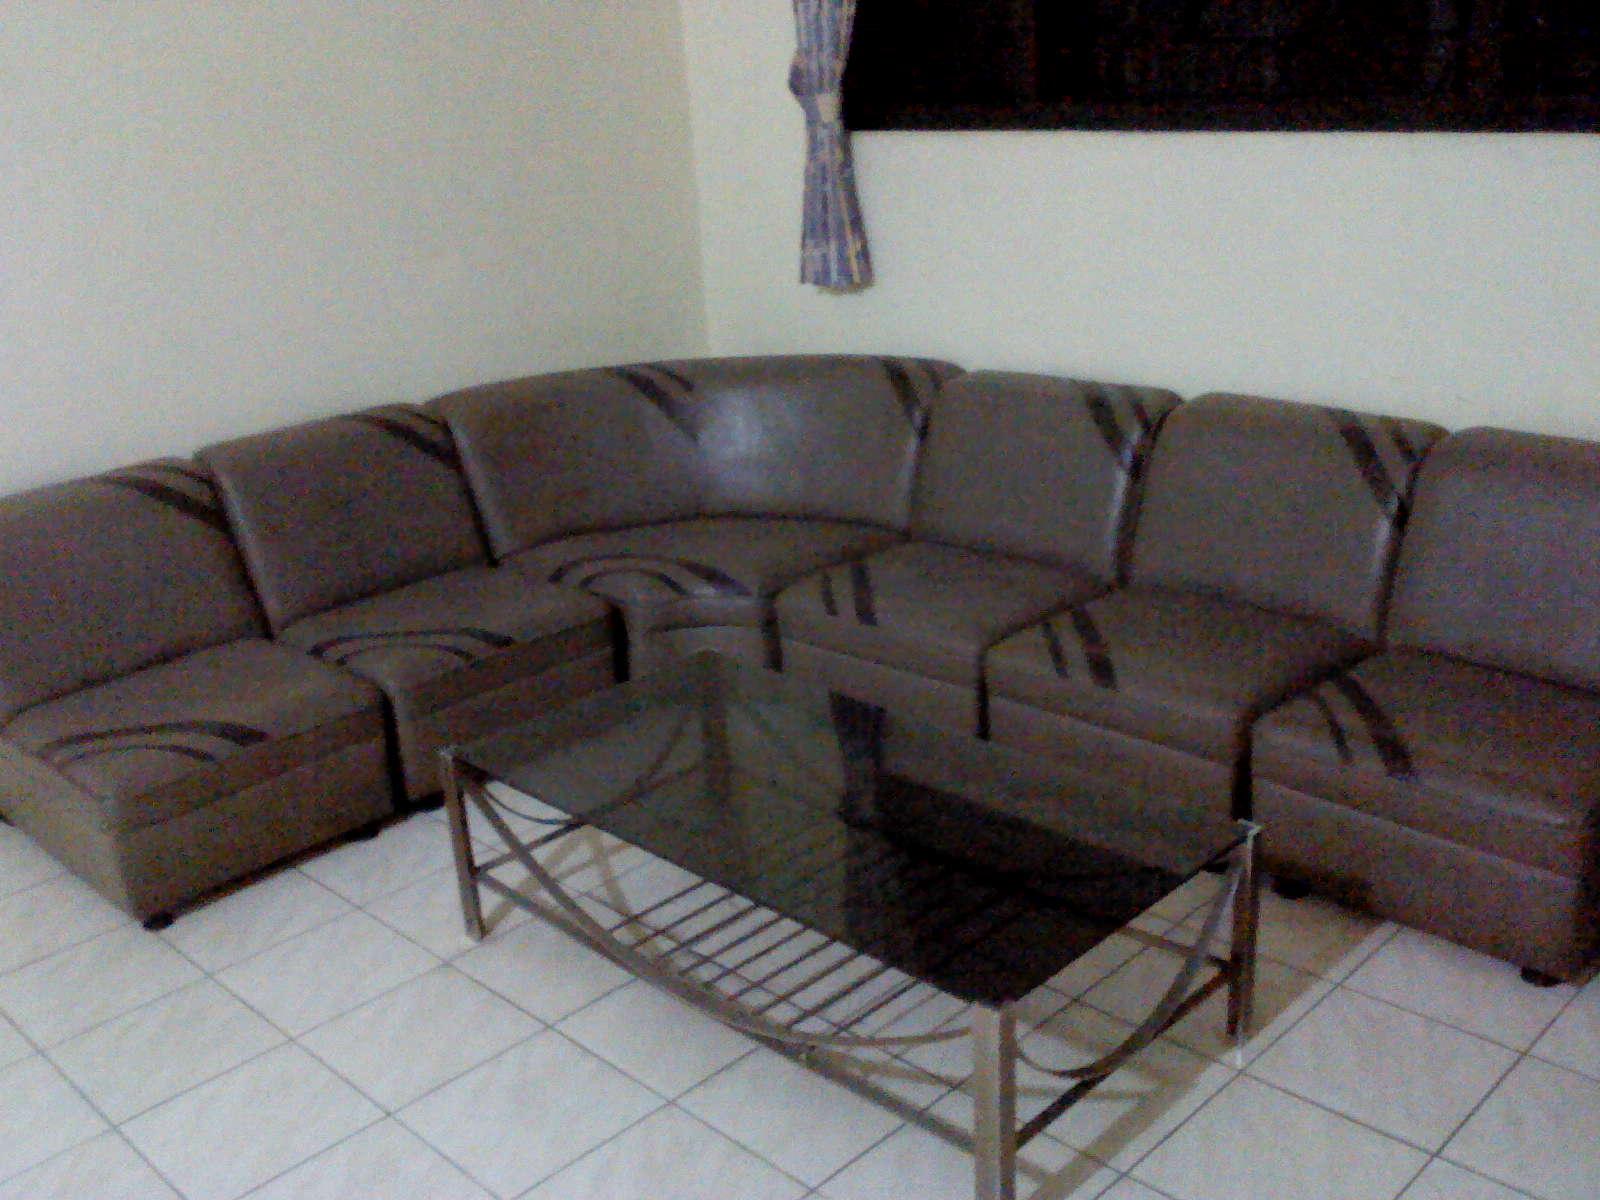 jual sofa bed murah di jakarta selatan gray tweed beli bekas malang stkittsvilla